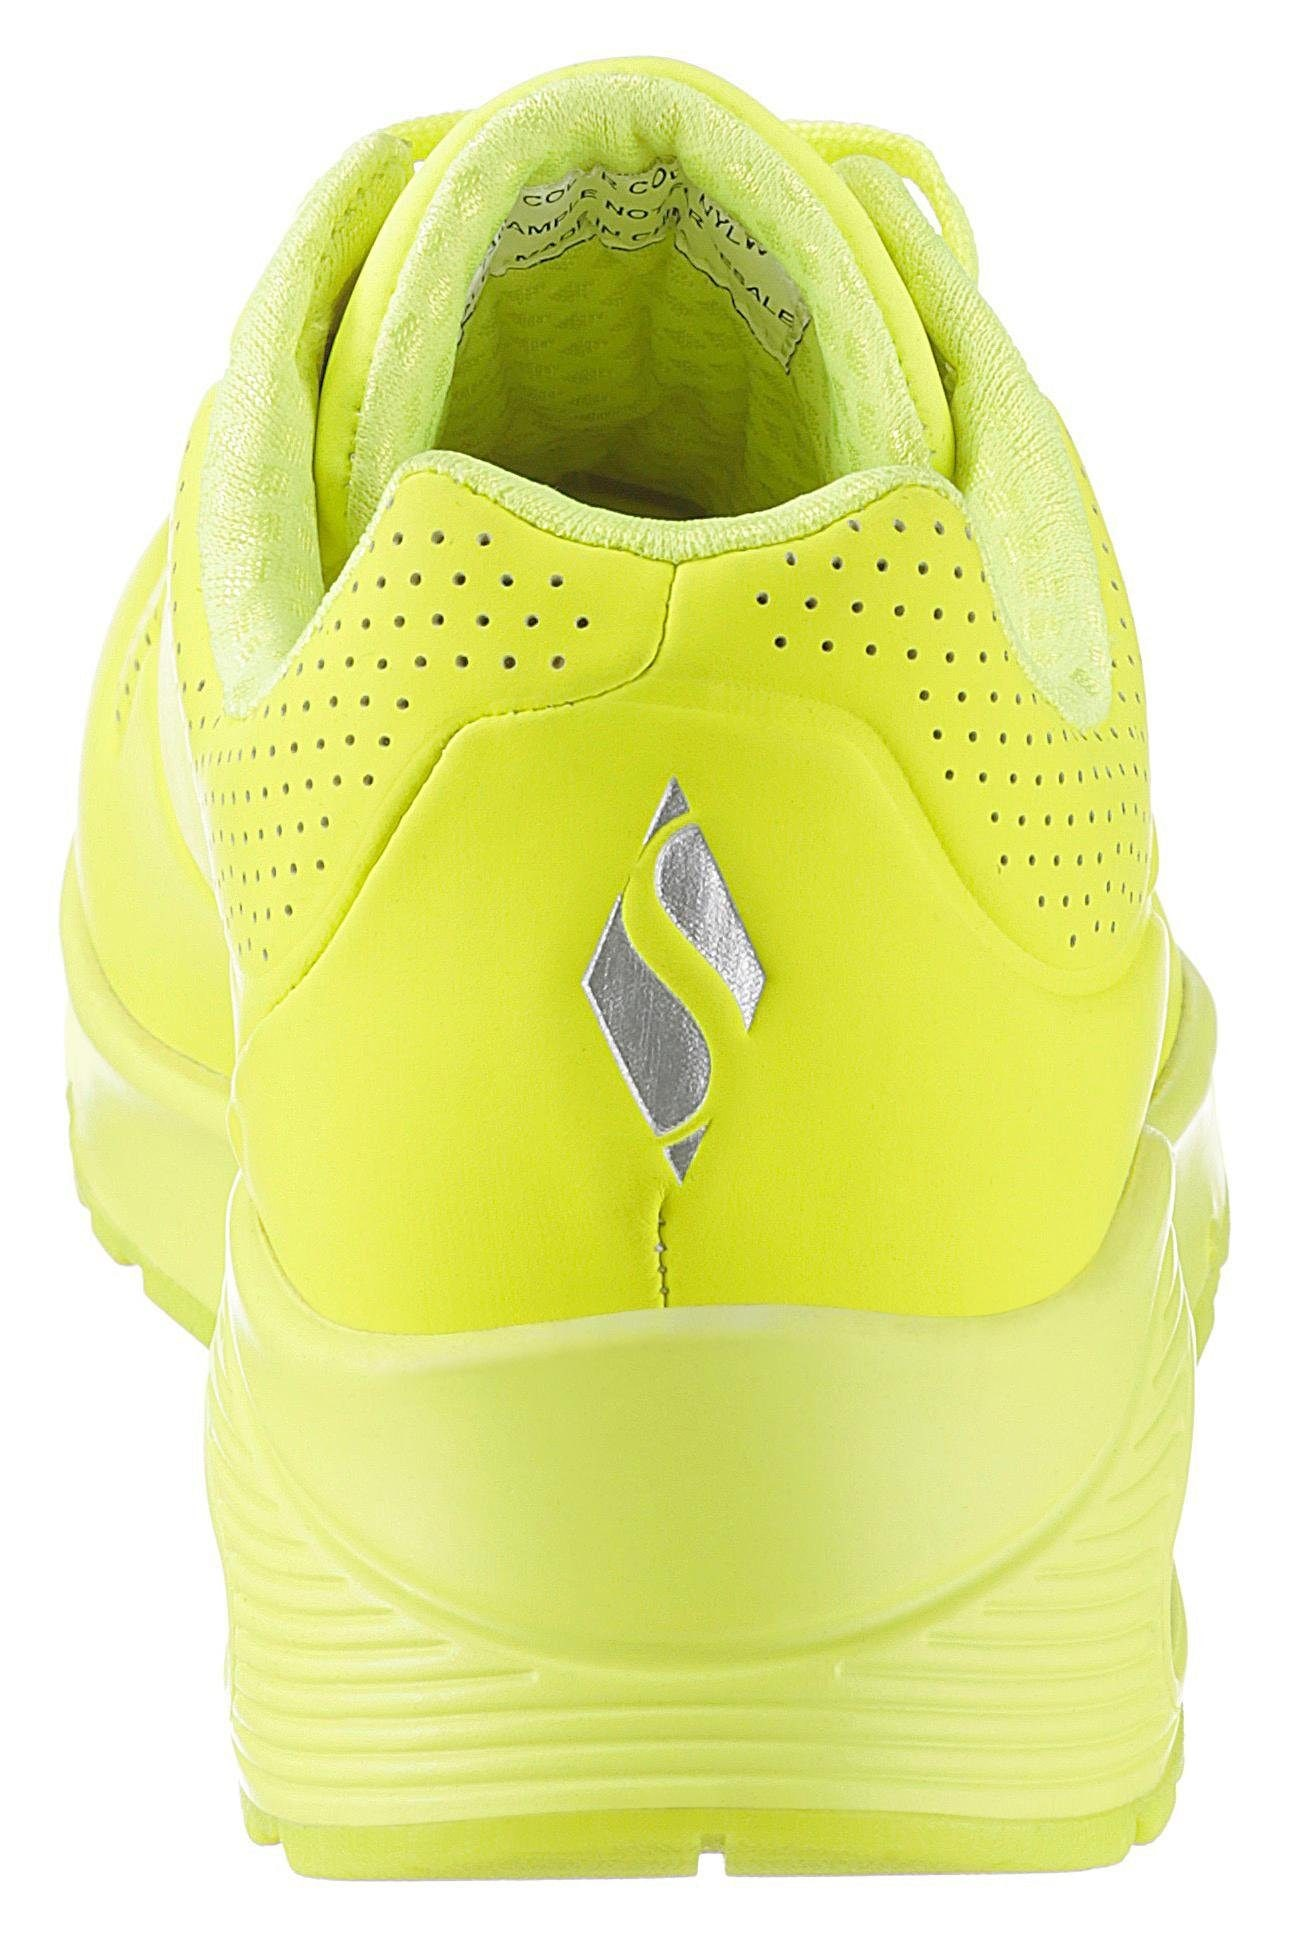 Details zu Skechers Wedgesneaker Uno Night Shades Schuhe Damen Wedge Sneaker